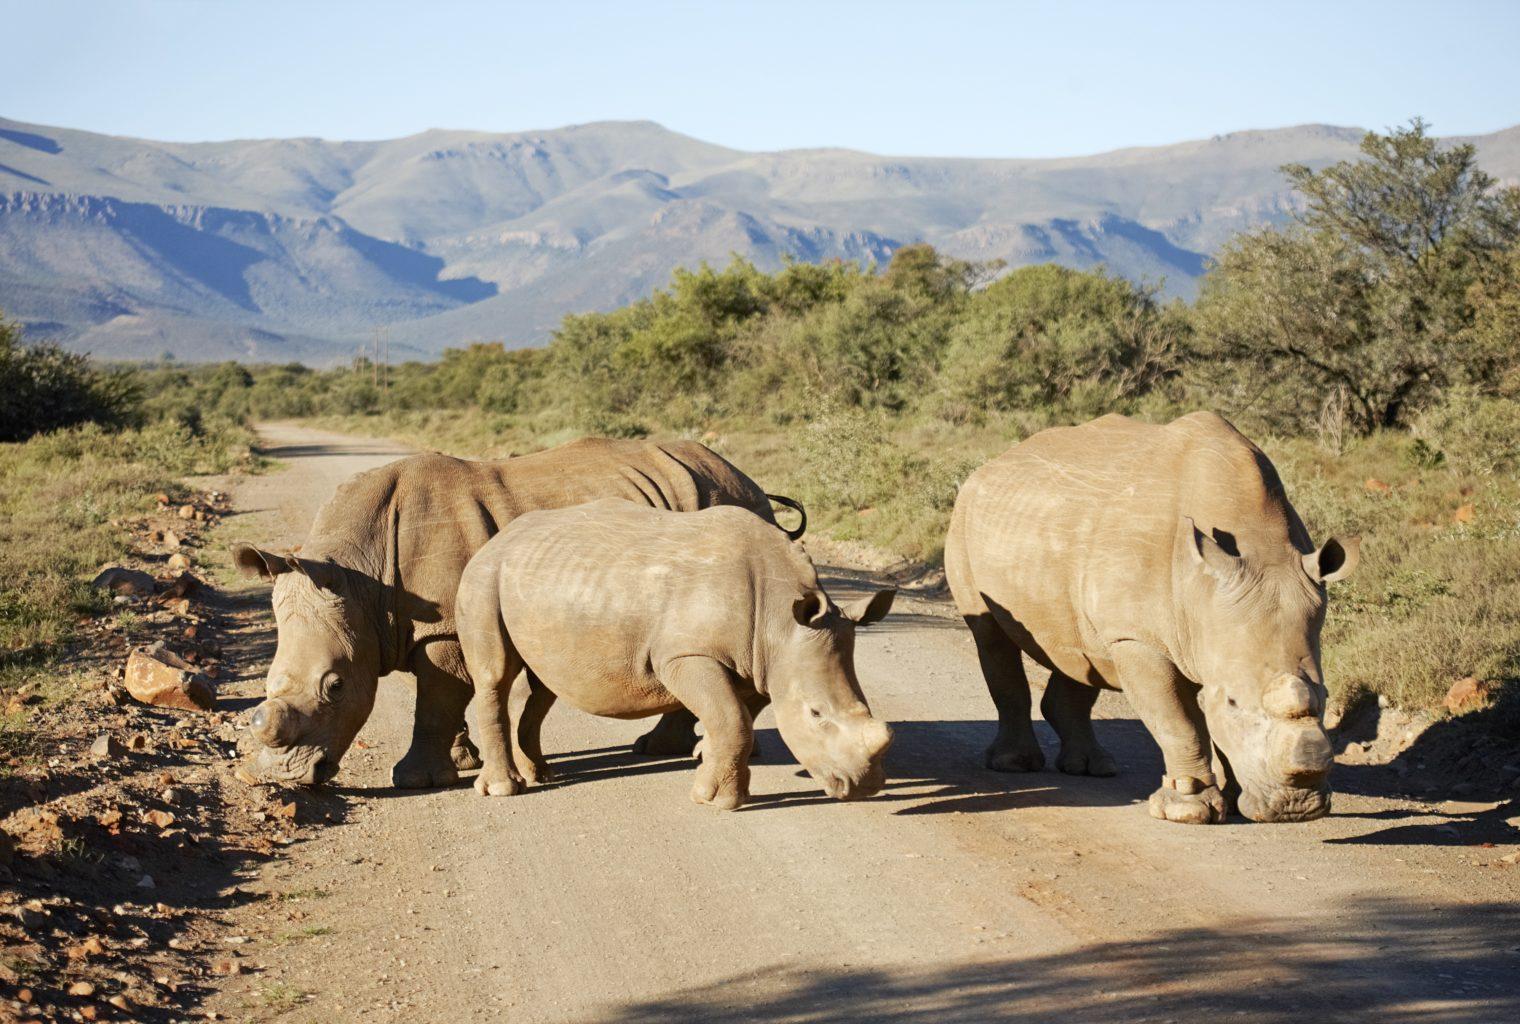 Rhinos in The Great Karoo